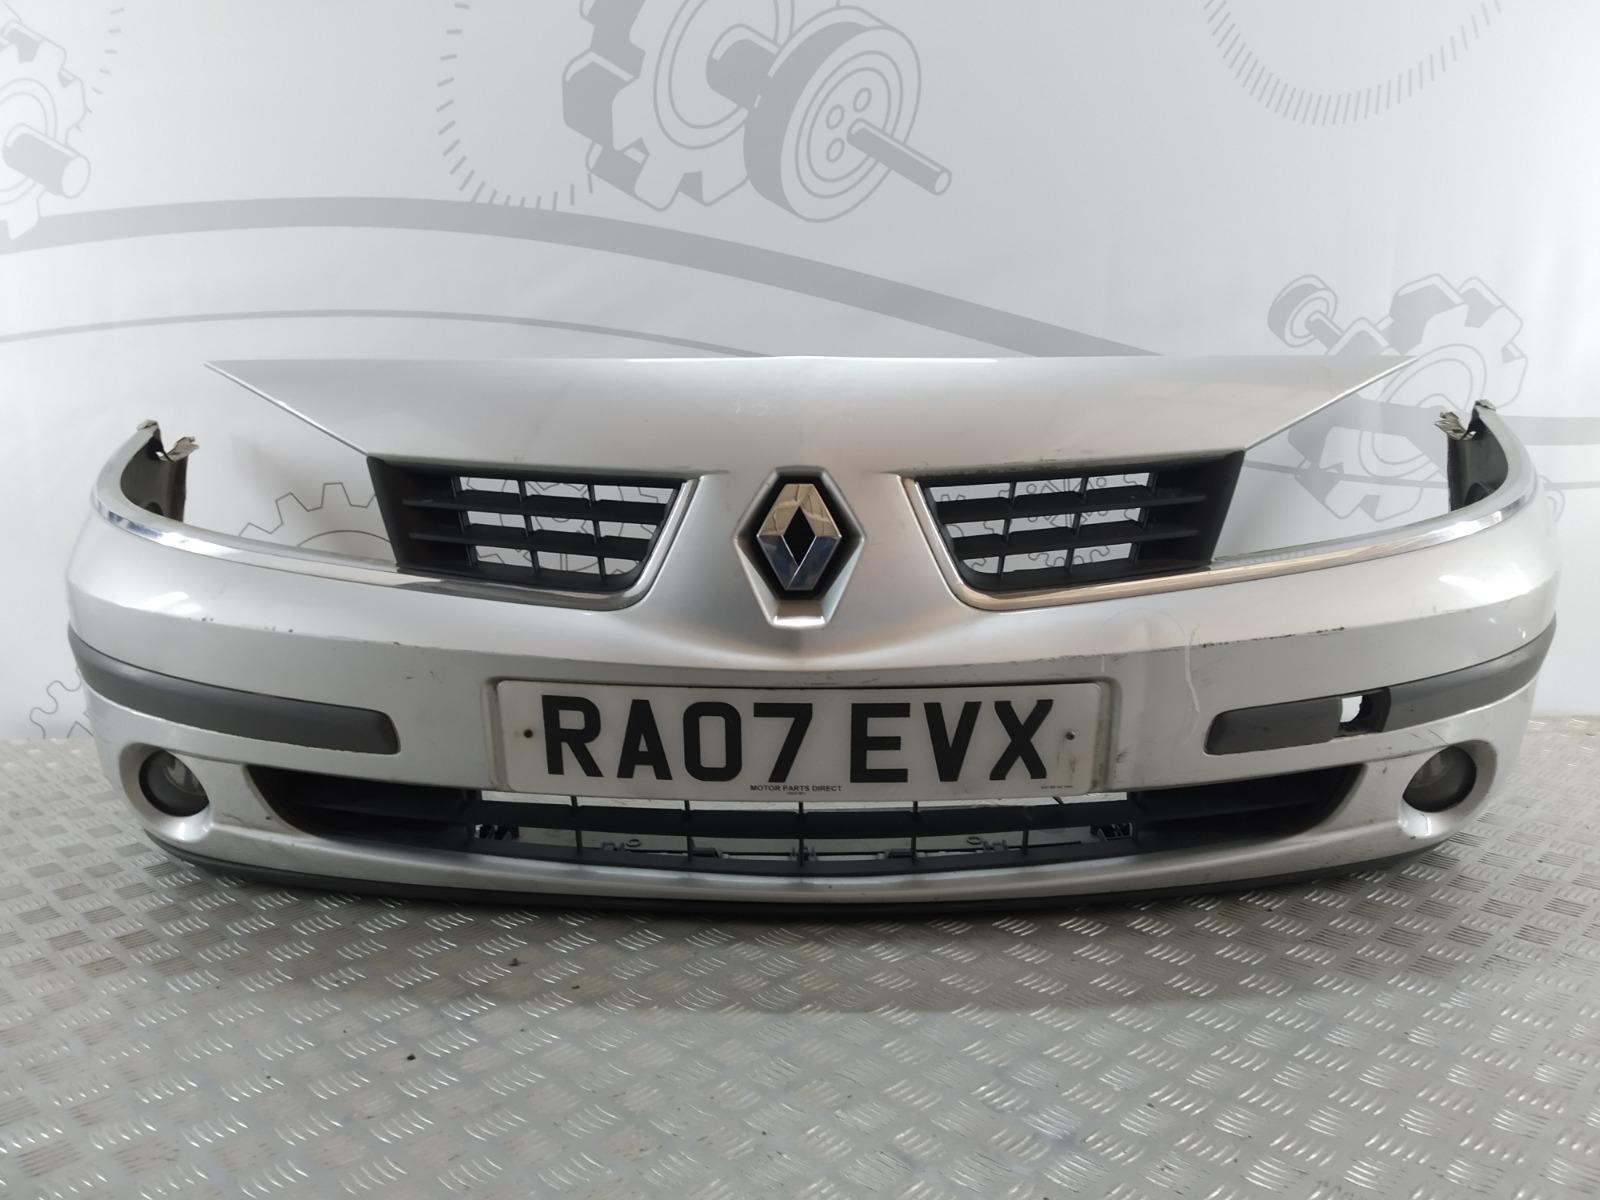 Бампер передний Renault Laguna 1.9 DCI 2007 (б/у)